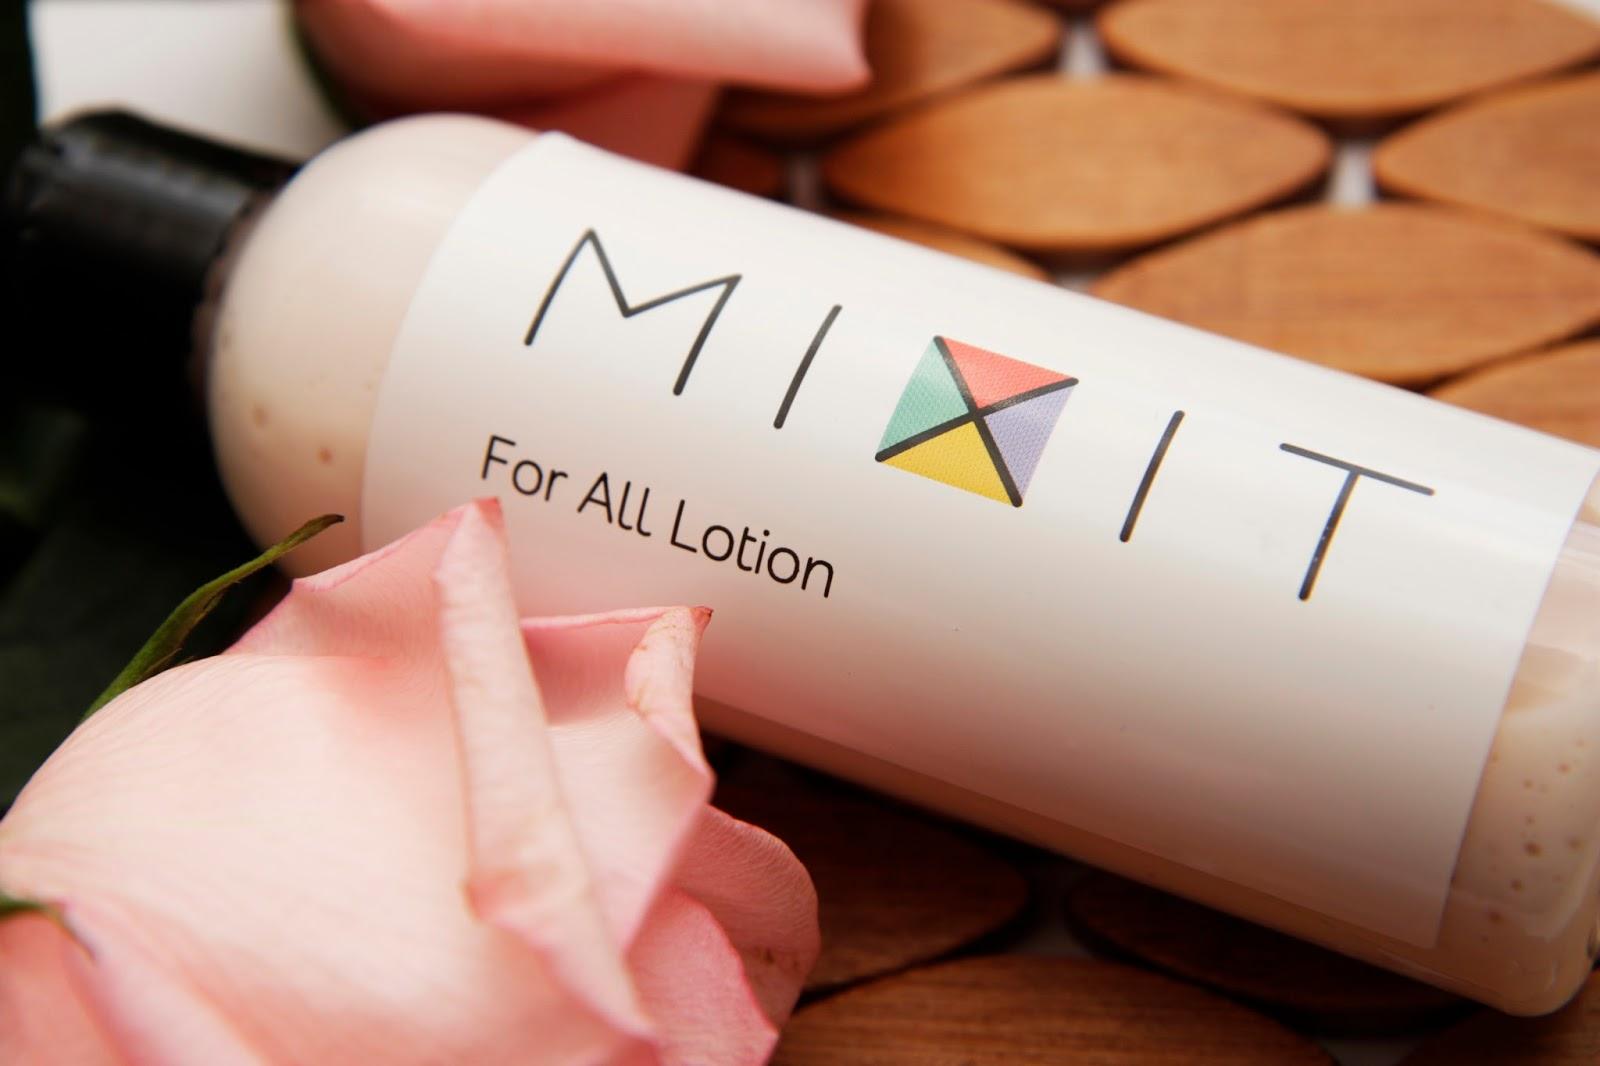 Mixit косметика для лица